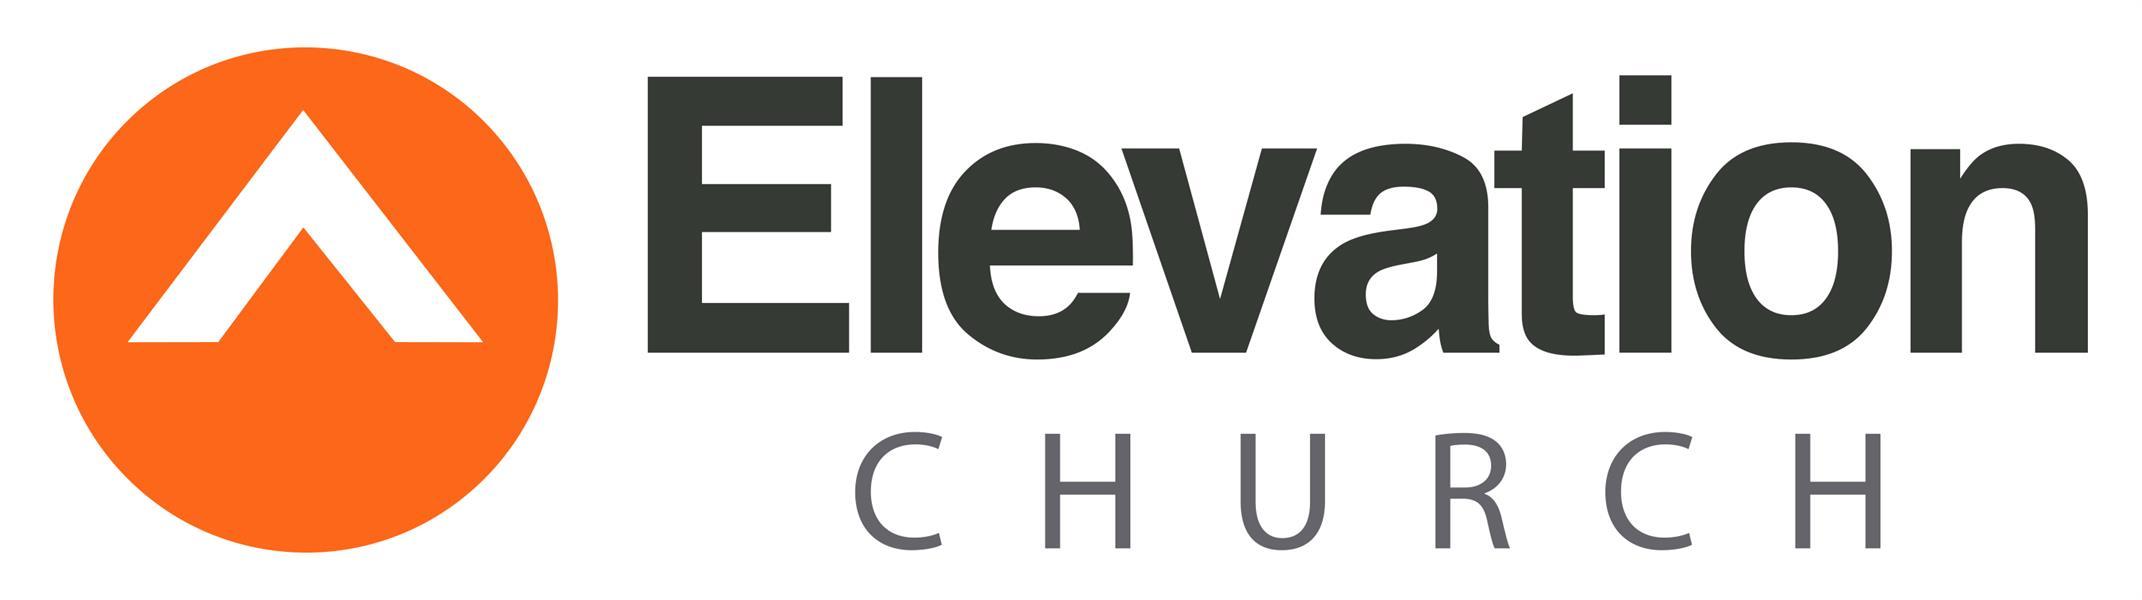 Elevation Church - Matthews